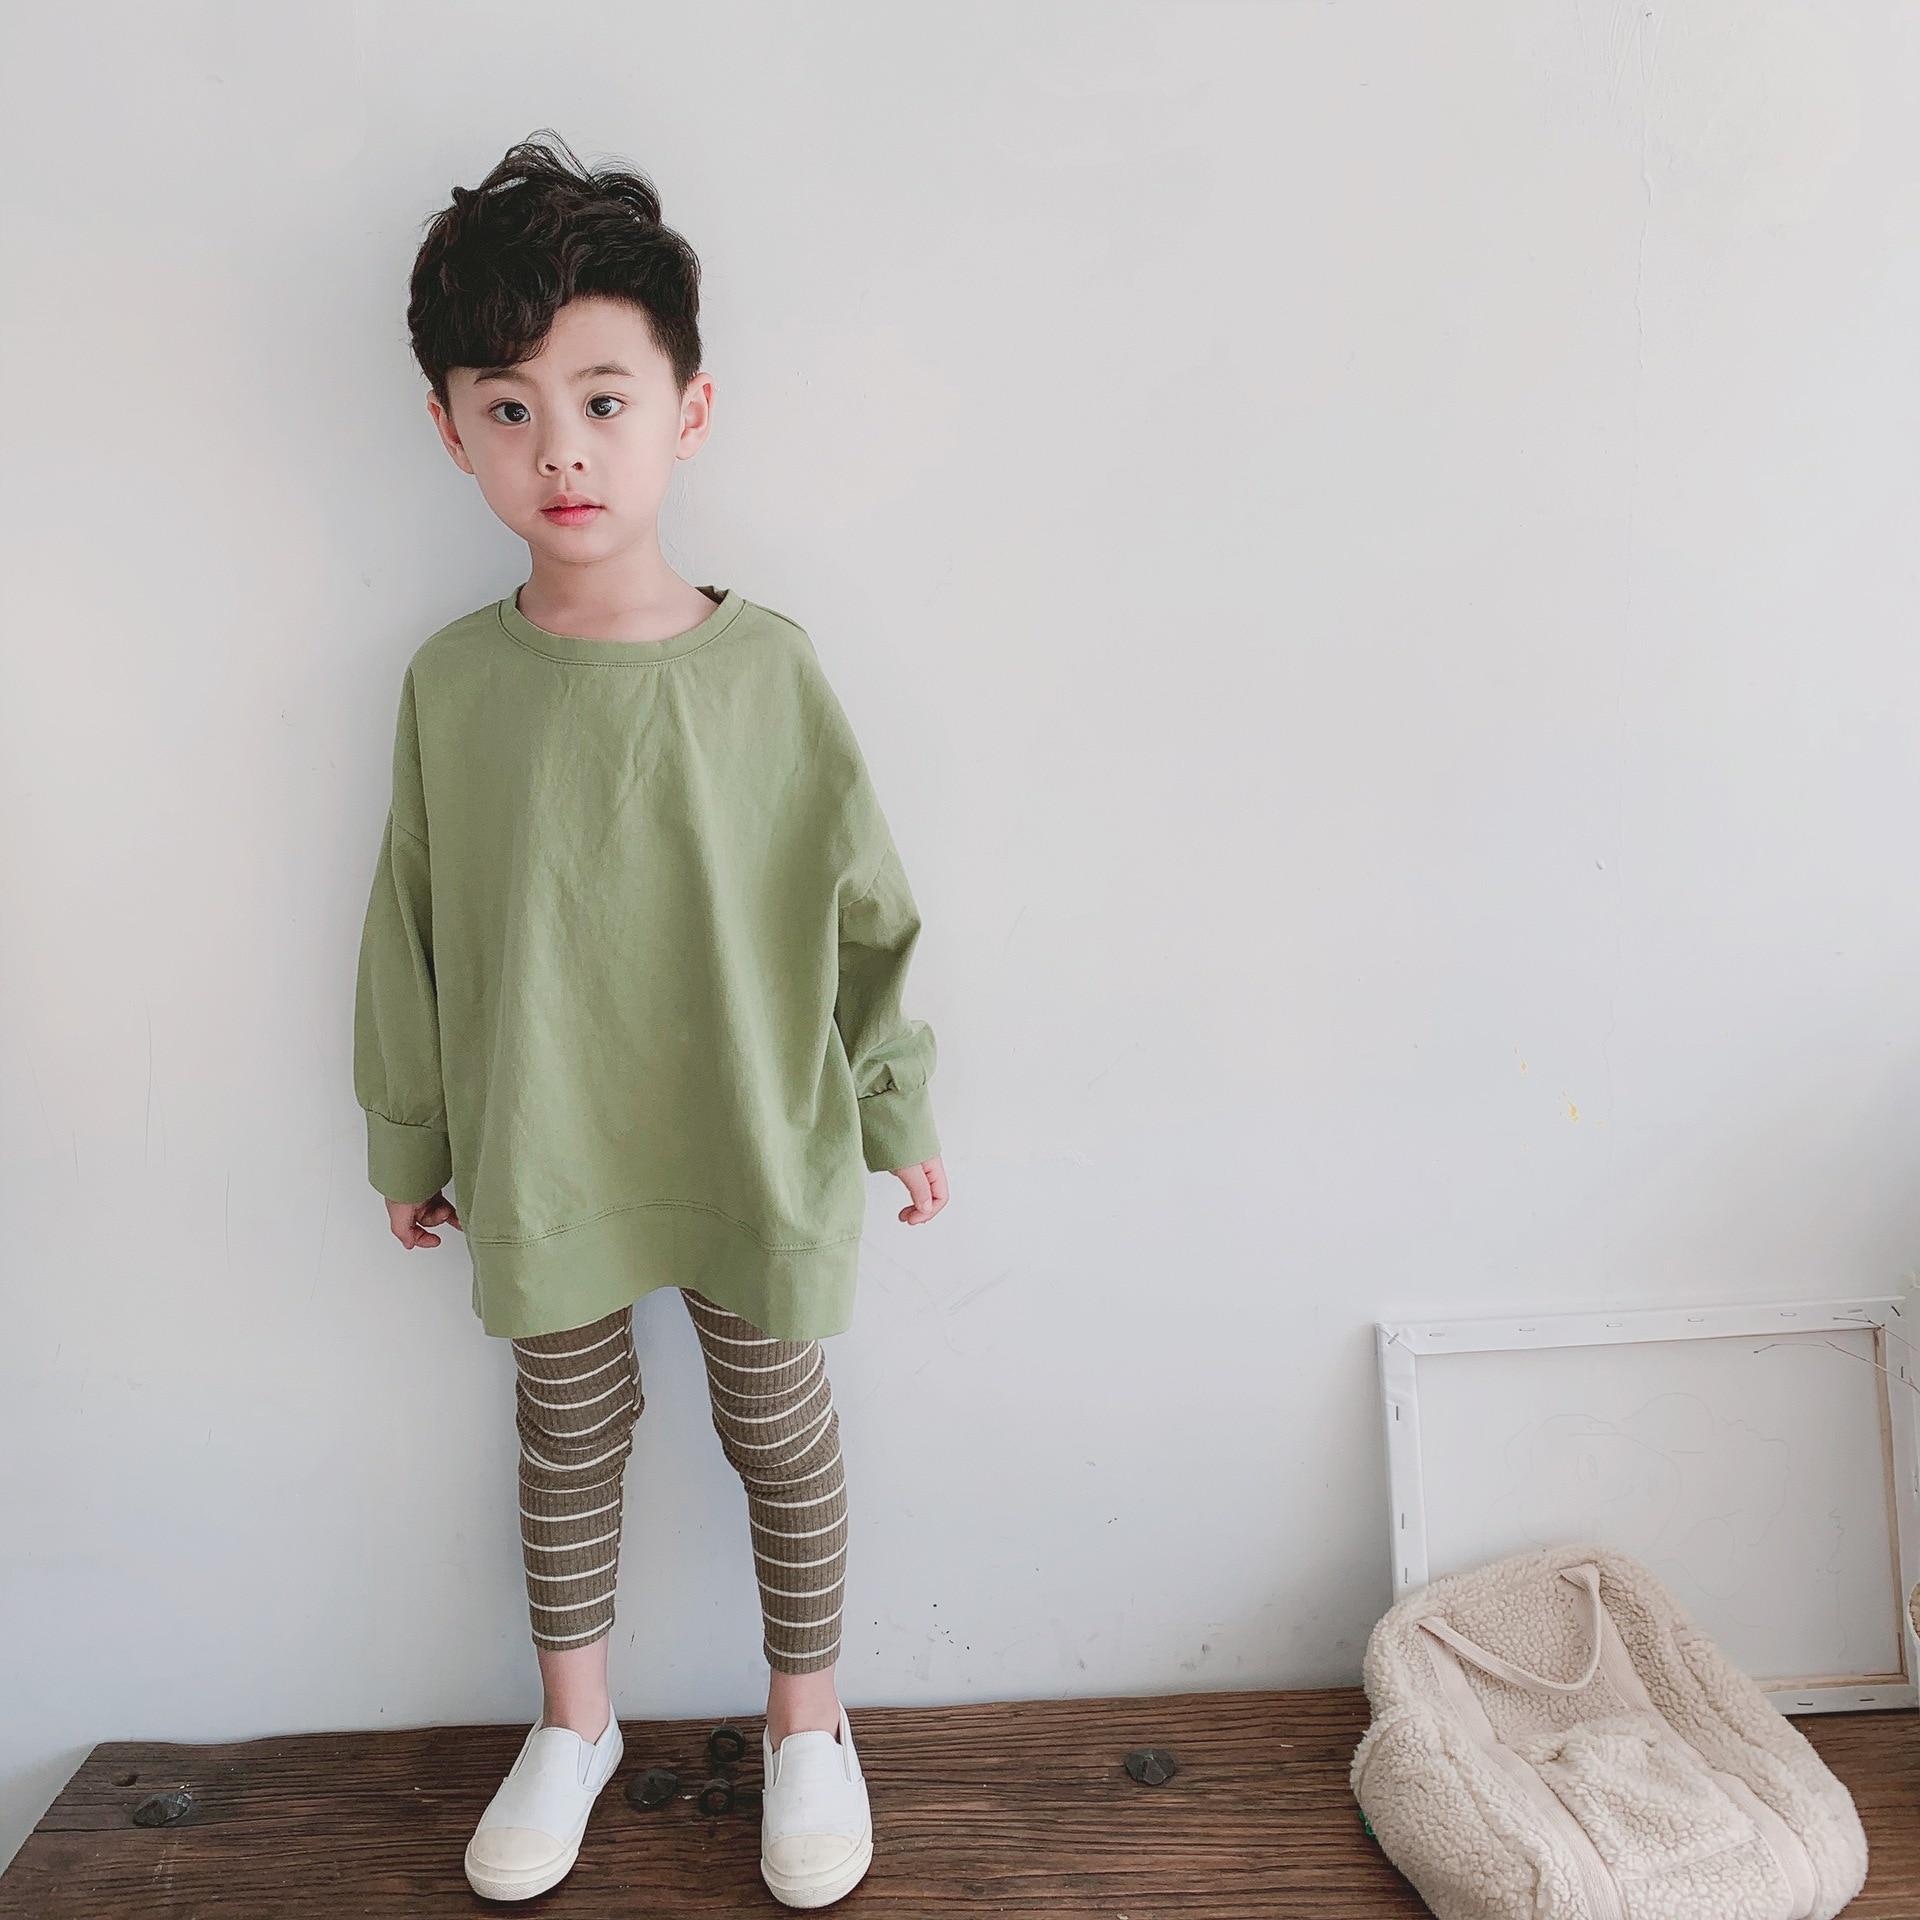 Primavera niño niña ropa camiseta manga larga pinkycolor dulce algodón cuello redondo algodón Casual moda